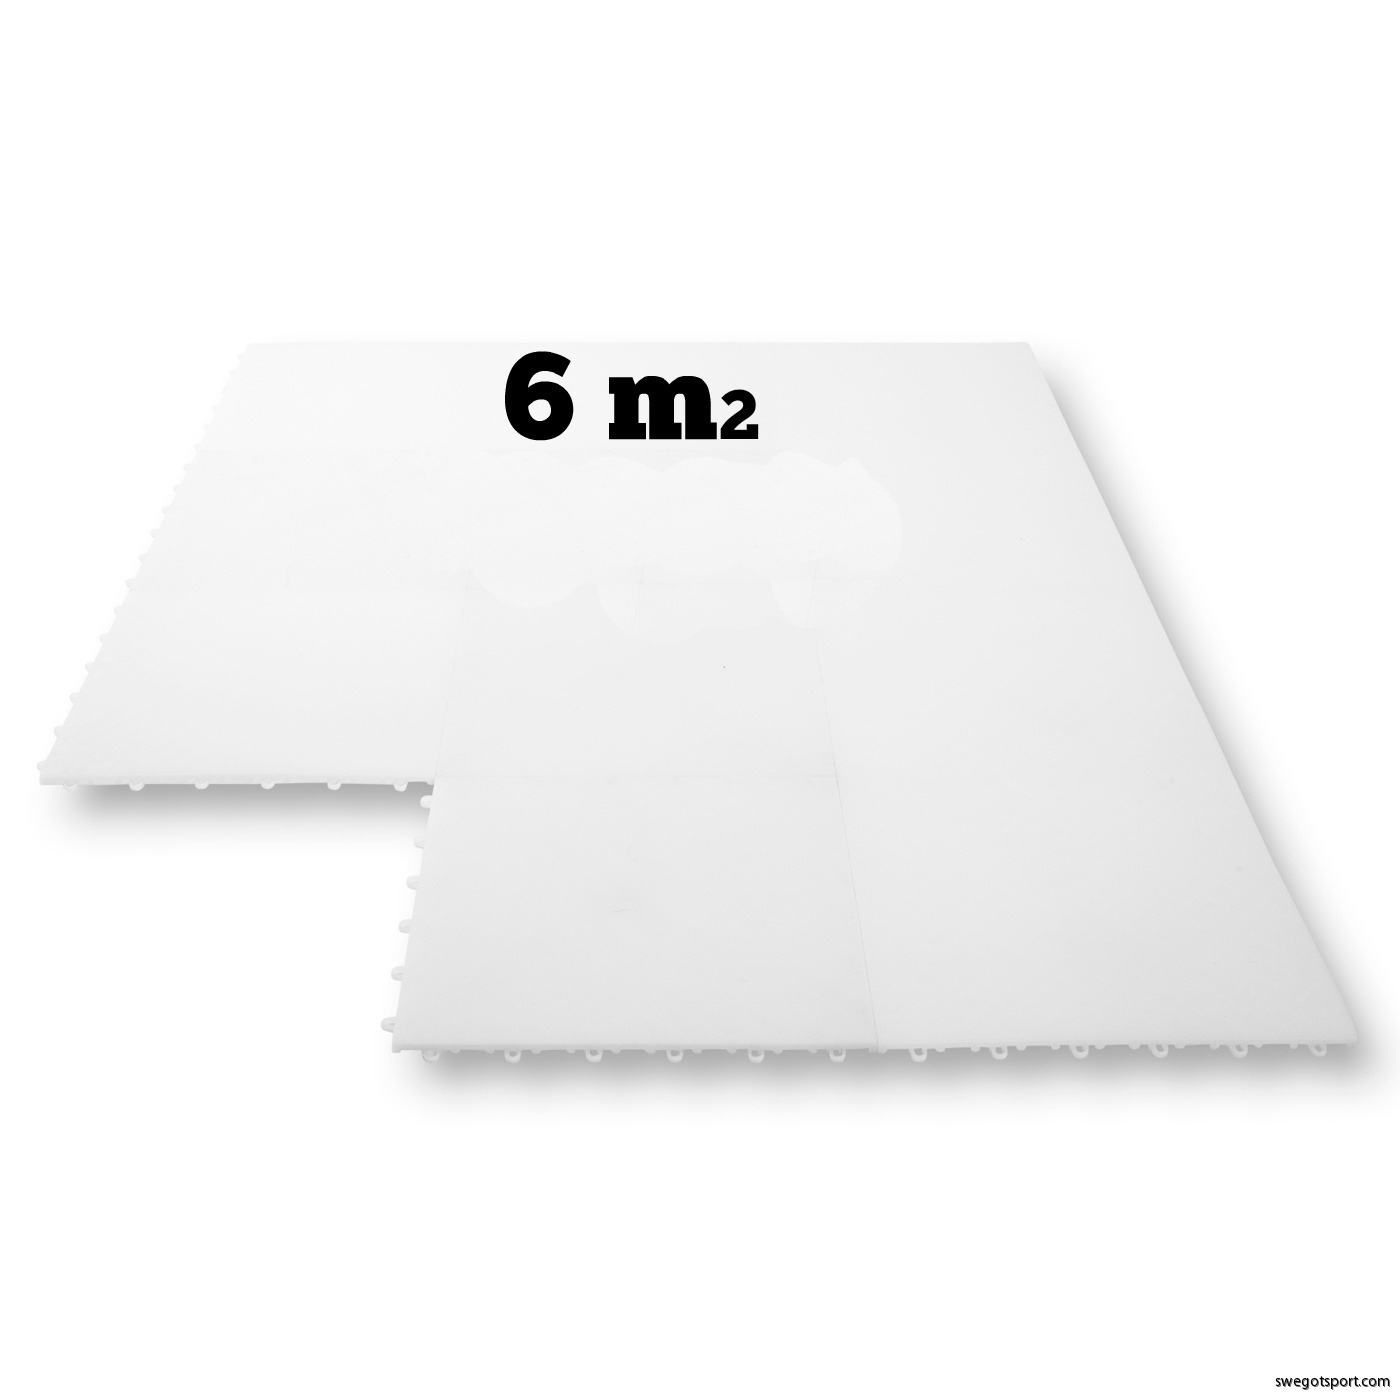 Paketprodukt - Plastis 6 kvm. Swegotsport